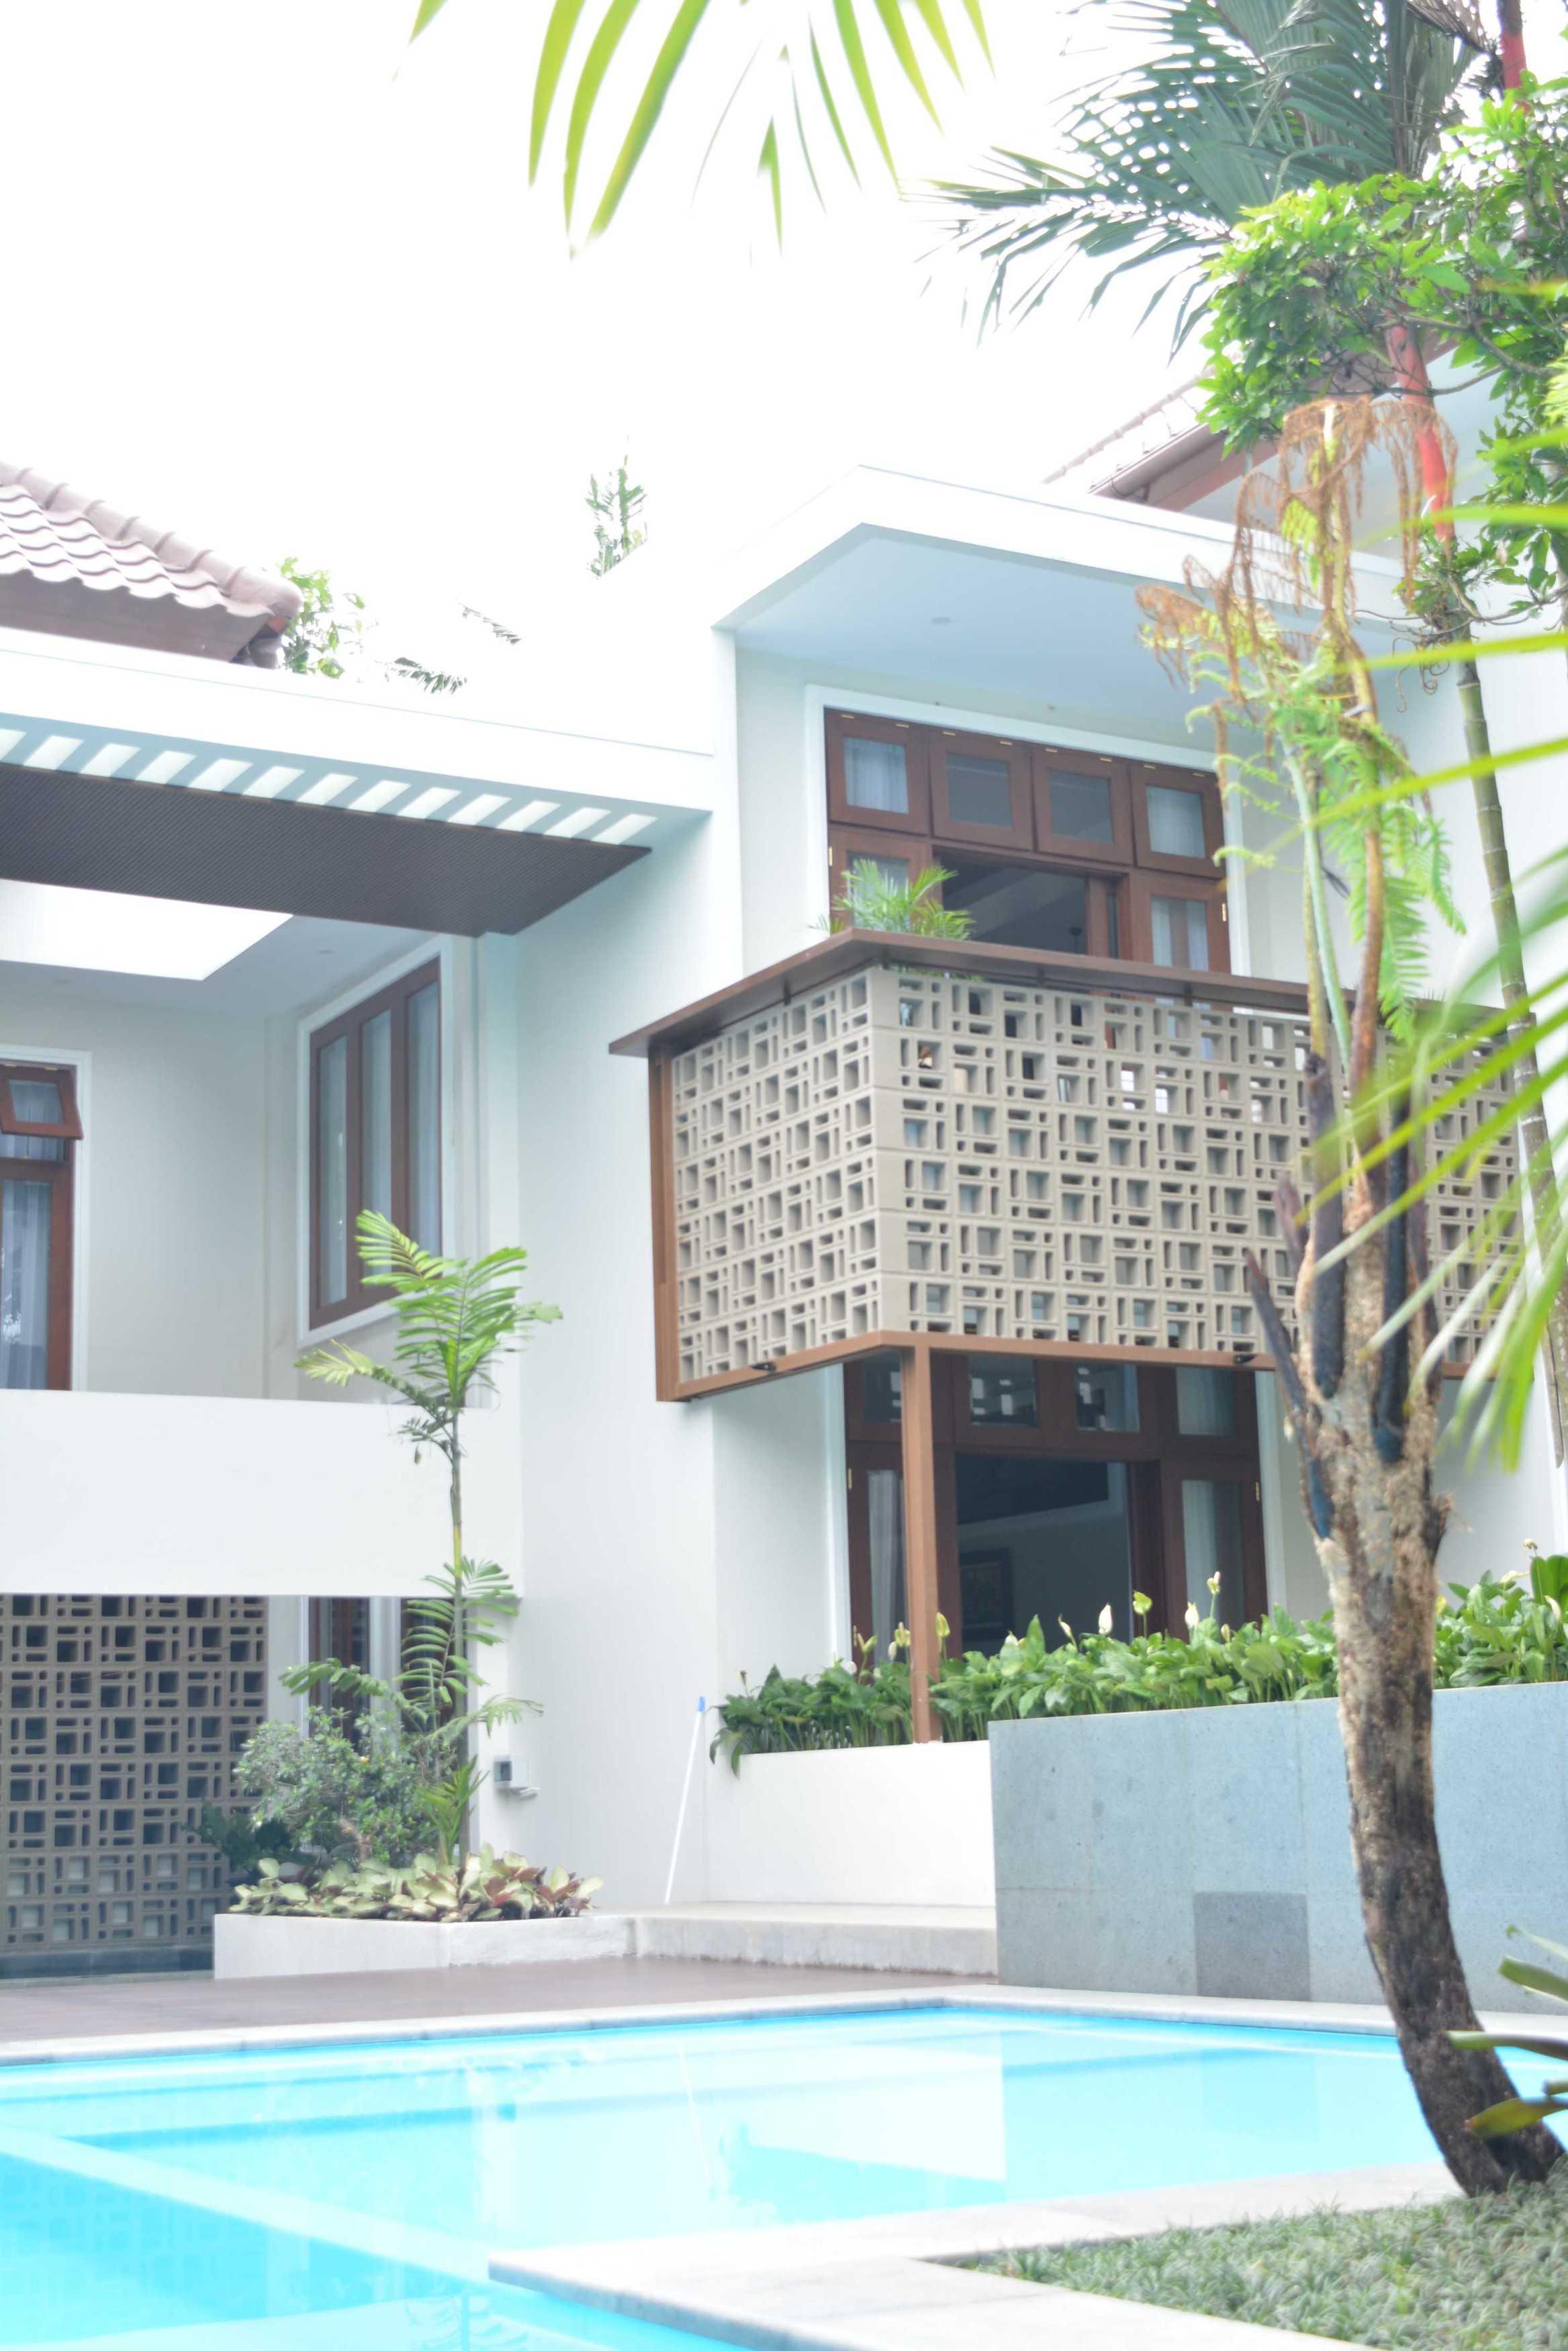 Psa Studio Villa Cimelati Sukabumi, West Java, Indonesia Sukabumi, West Java, Indonesia Swimmingpool-Area Modern  16507